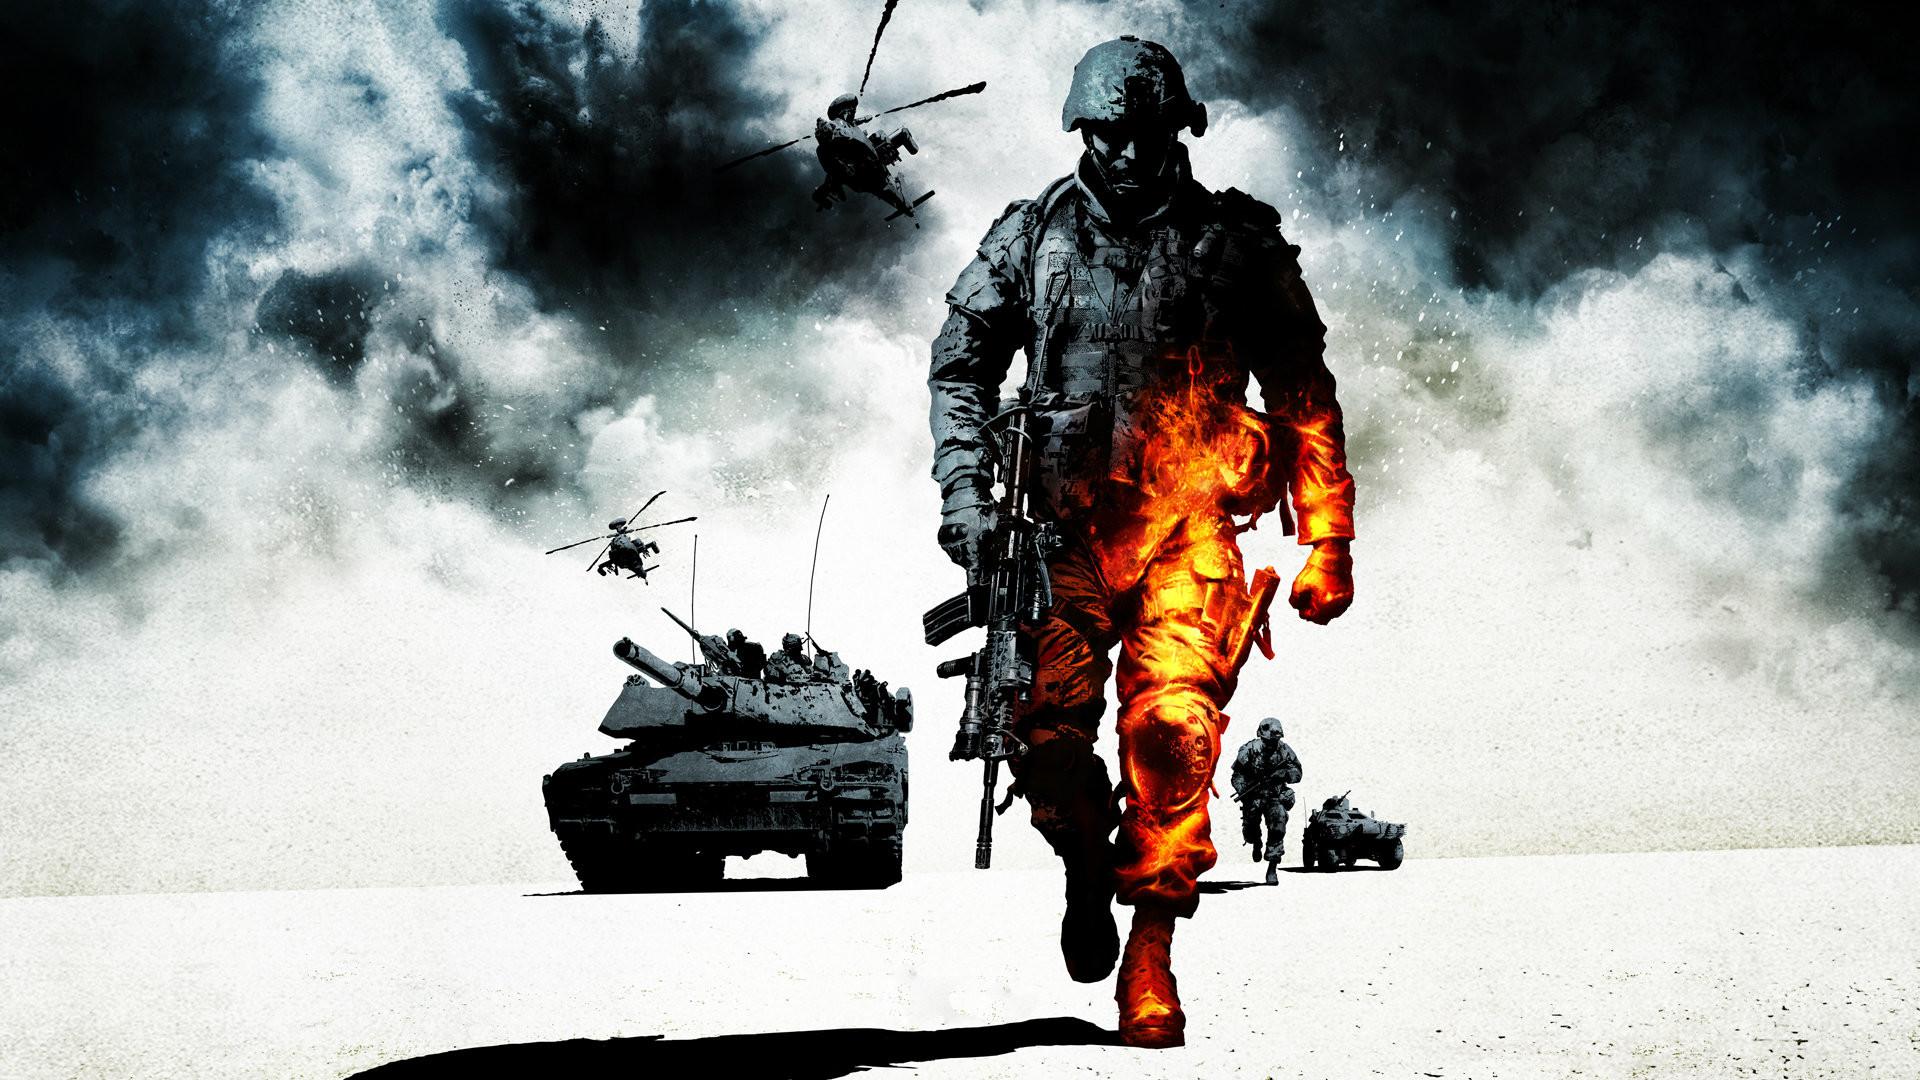 Best Action Games HD Wallpaper